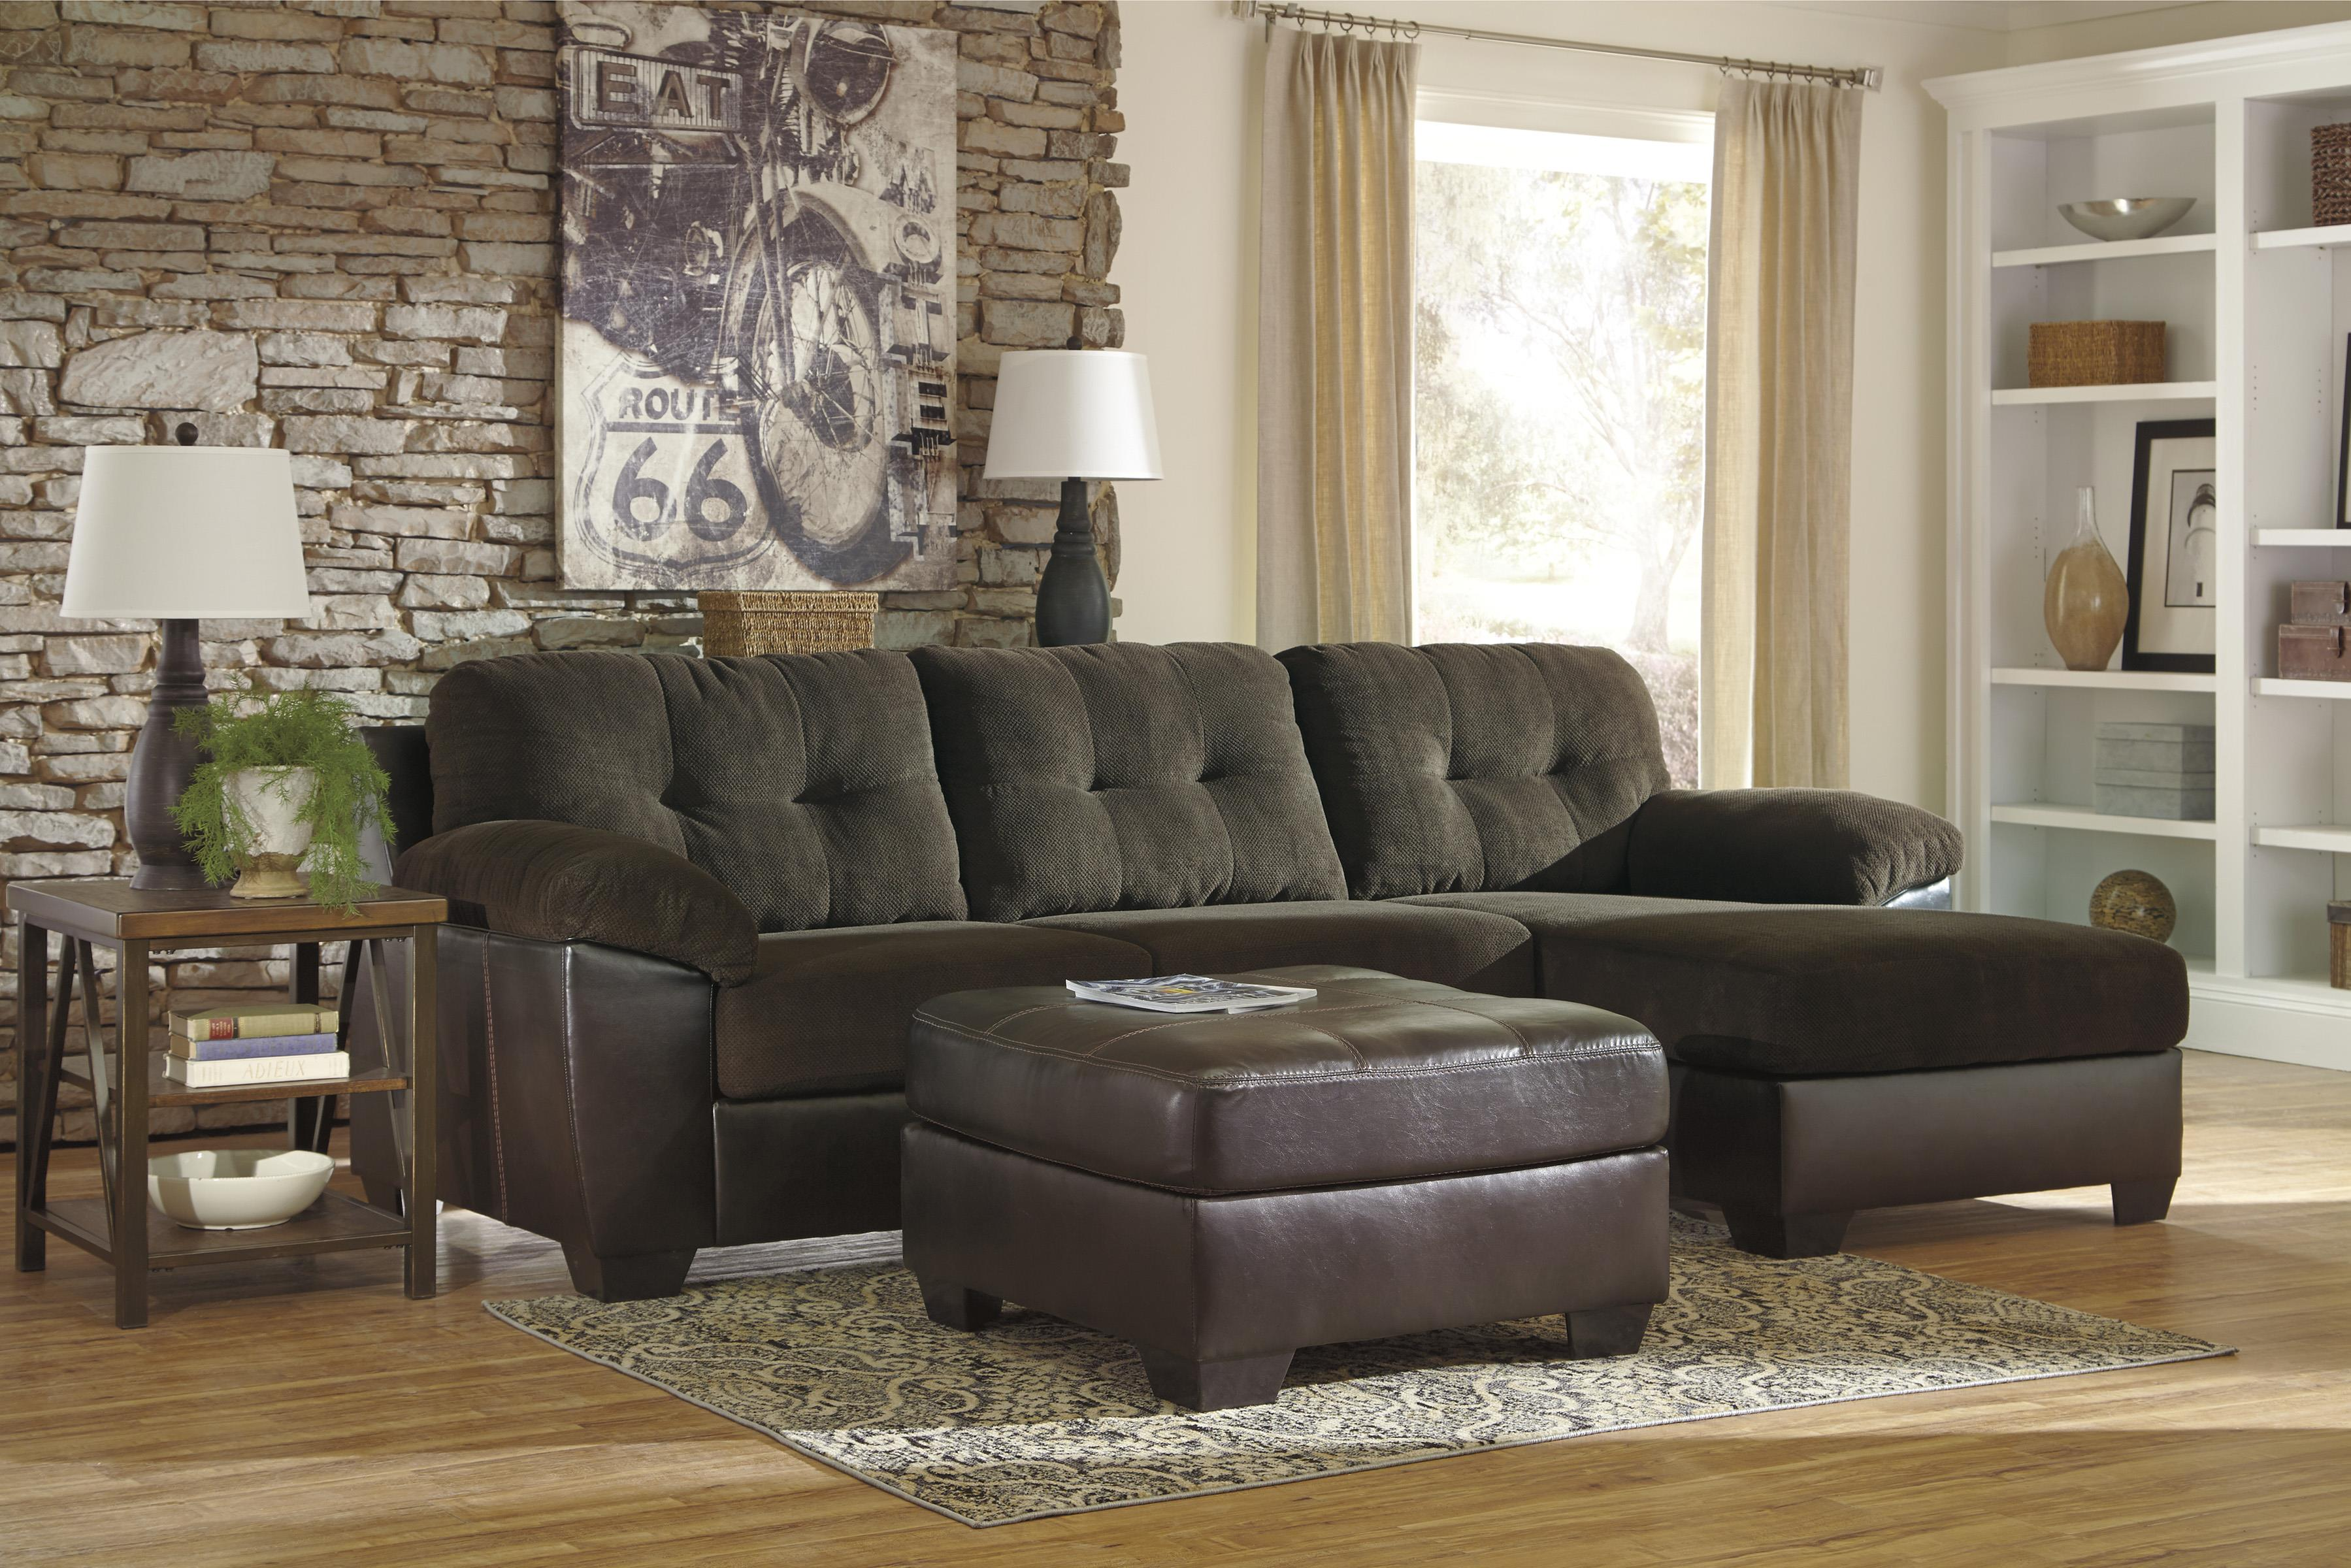 Benchcraft Vanleer Stationary Living Room Group - Item Number: 15900 Living Room Group 1